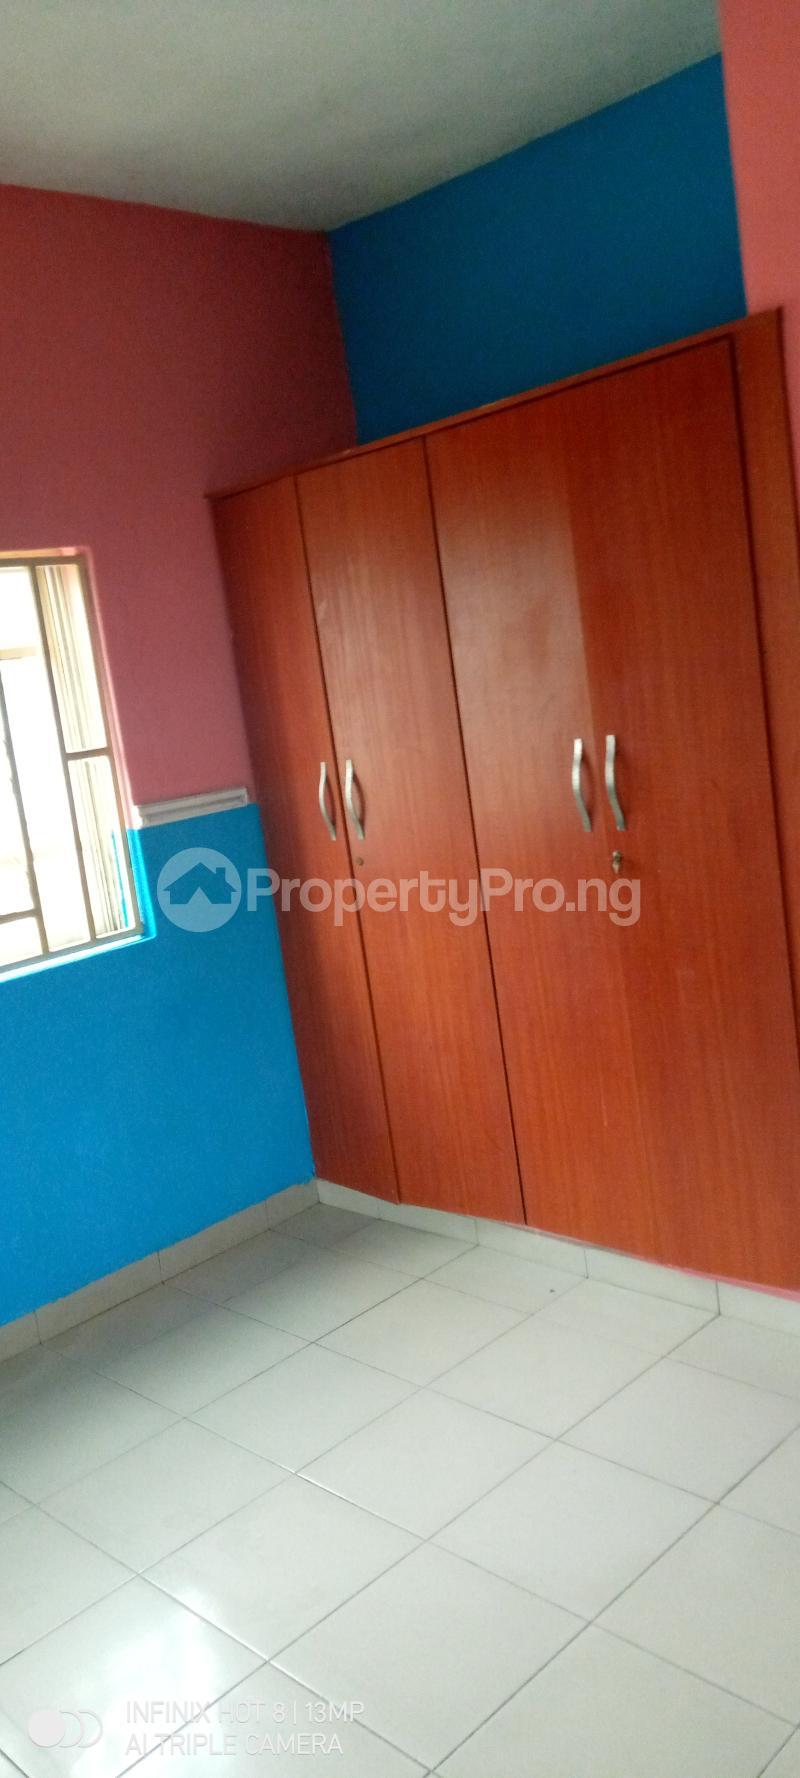 3 bedroom Flat / Apartment for rent Green field estate Amuwo Odofin Amuwo Odofin Lagos - 6